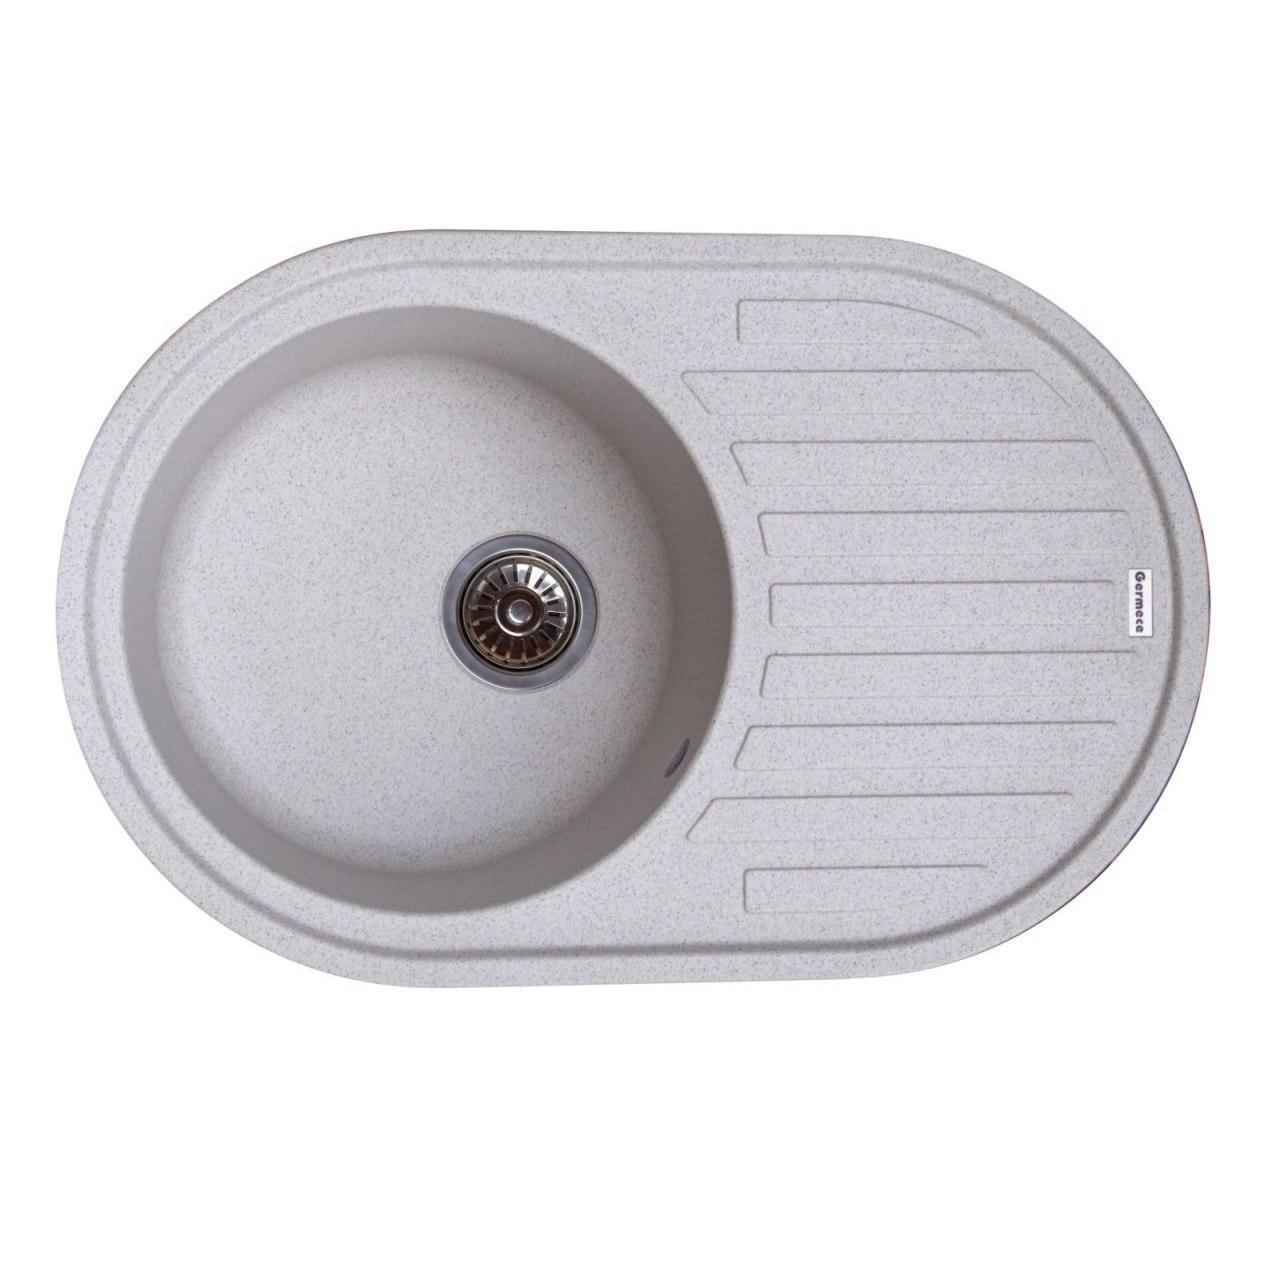 Гранітна мийка для кухні Platinum 7750 LIRA матова Білосніжна